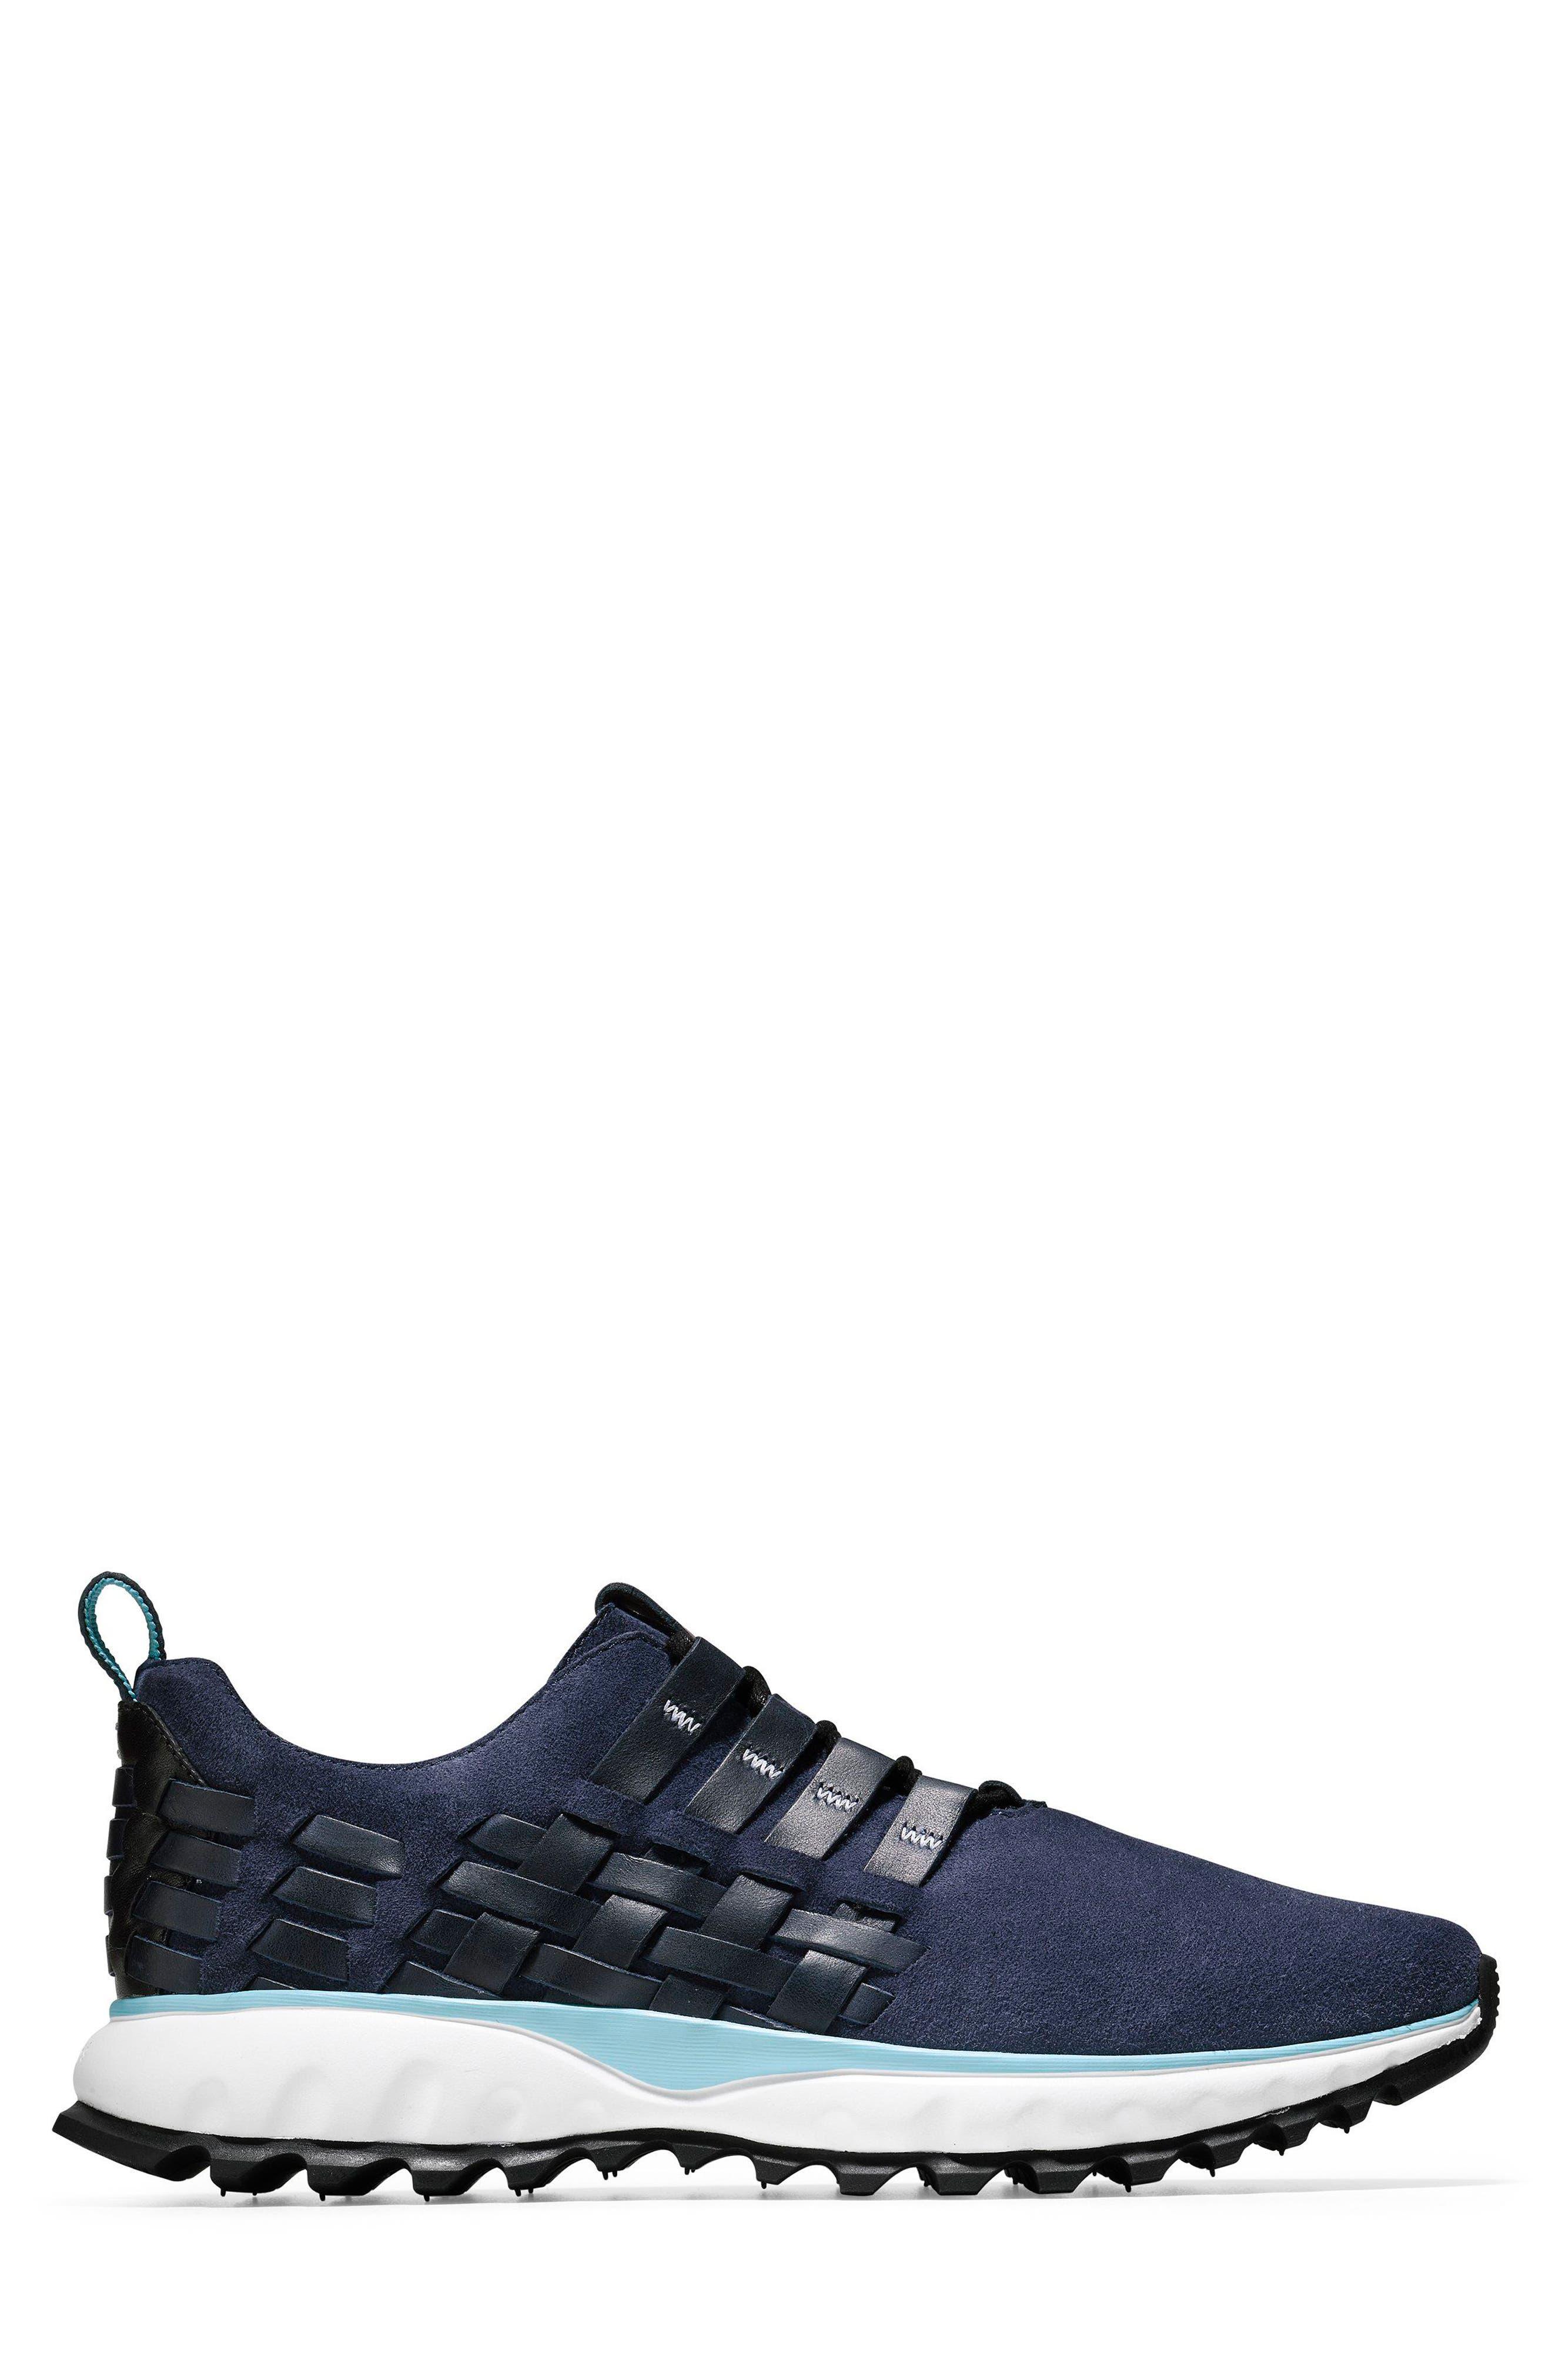 GrandExplore All Terrain Woven Sneaker,                             Alternate thumbnail 3, color,                             Marine Blue/Optic White/Black